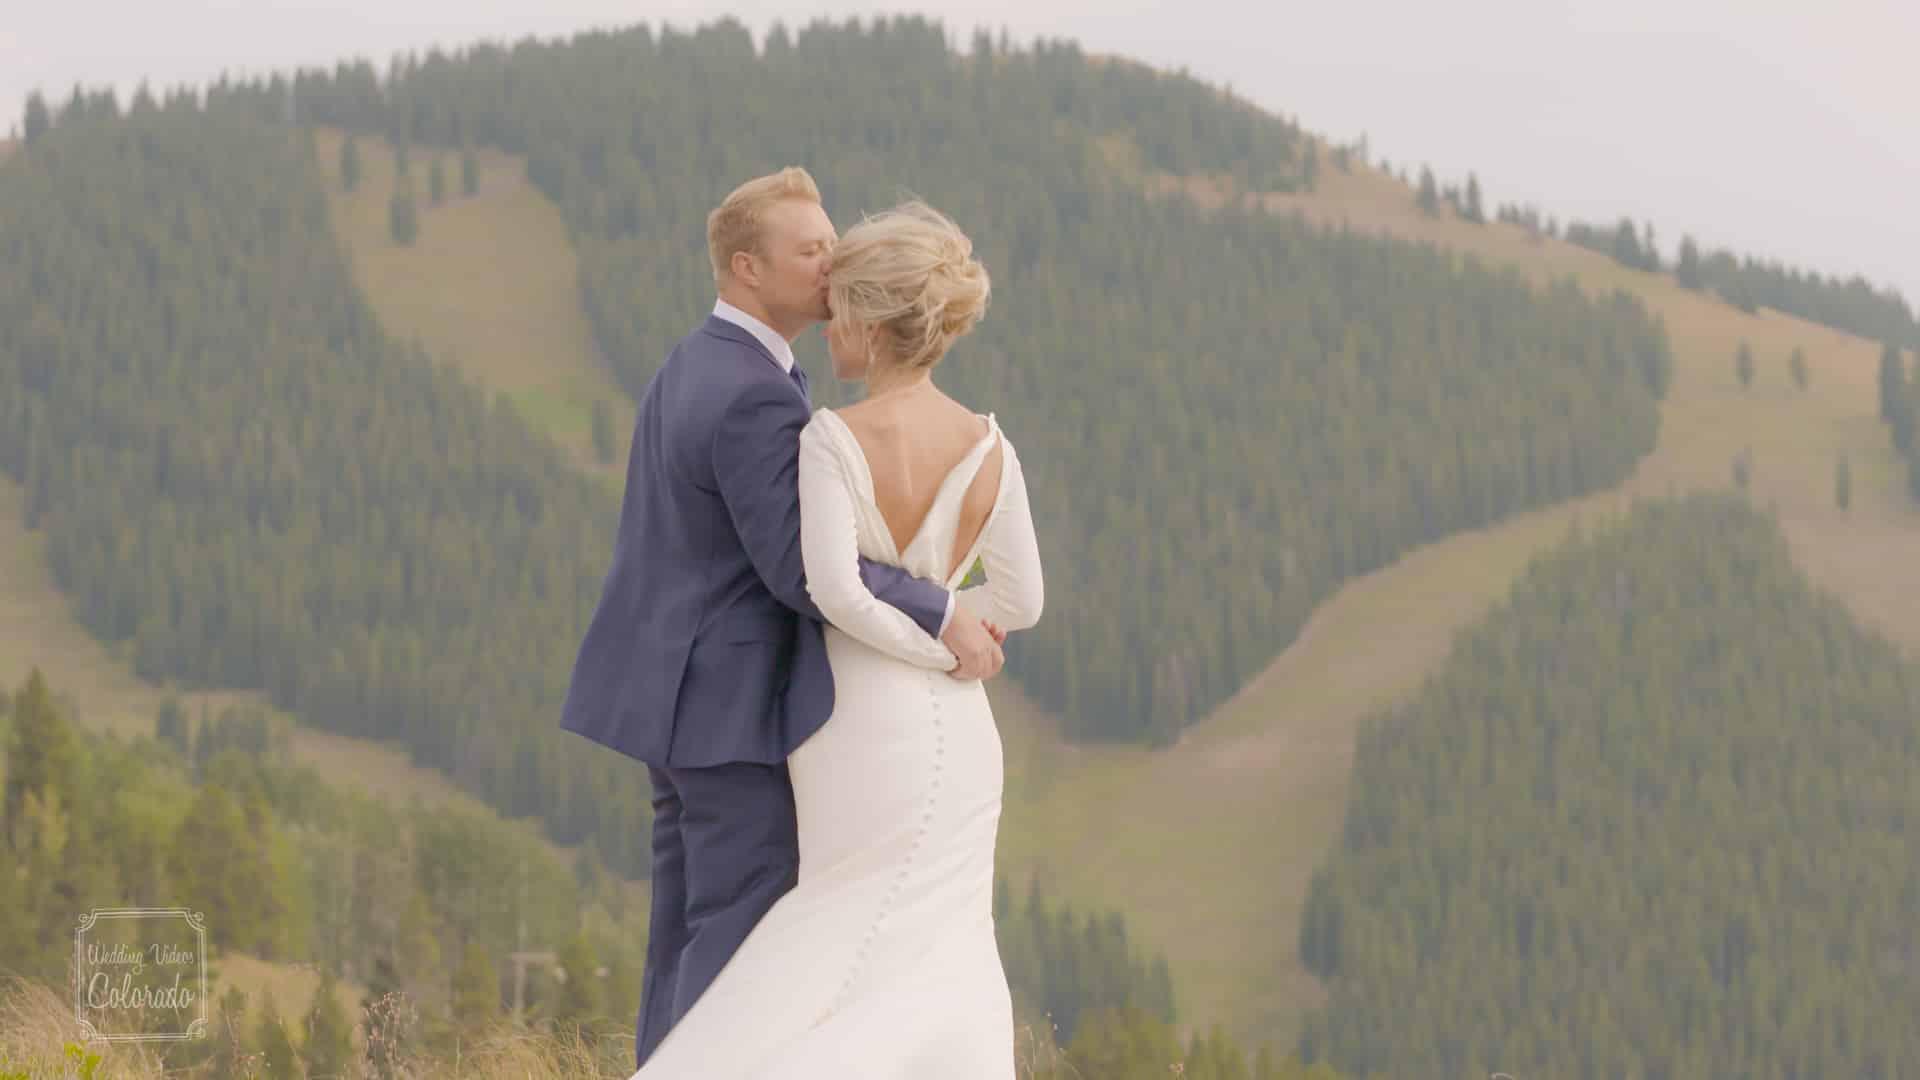 Matt Emily Vail Wedding Video